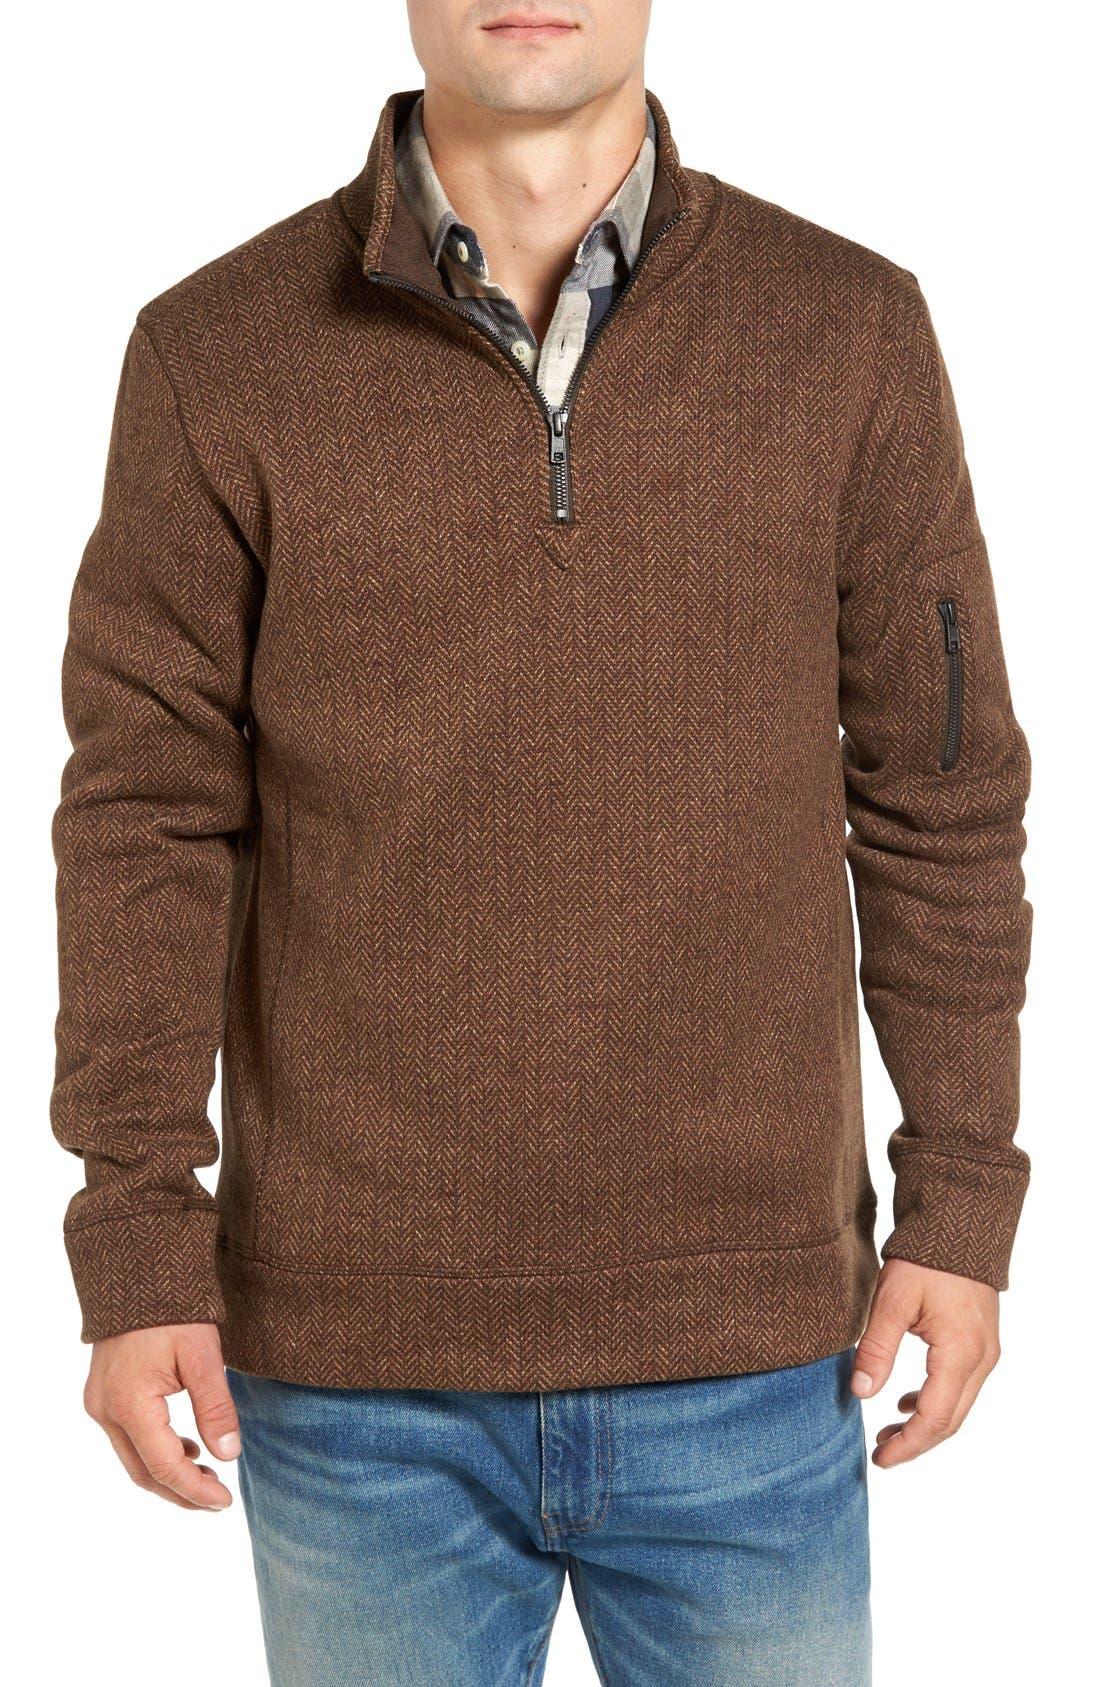 Jeremiah Lance Herringbone Zip Mock Neck Sweater